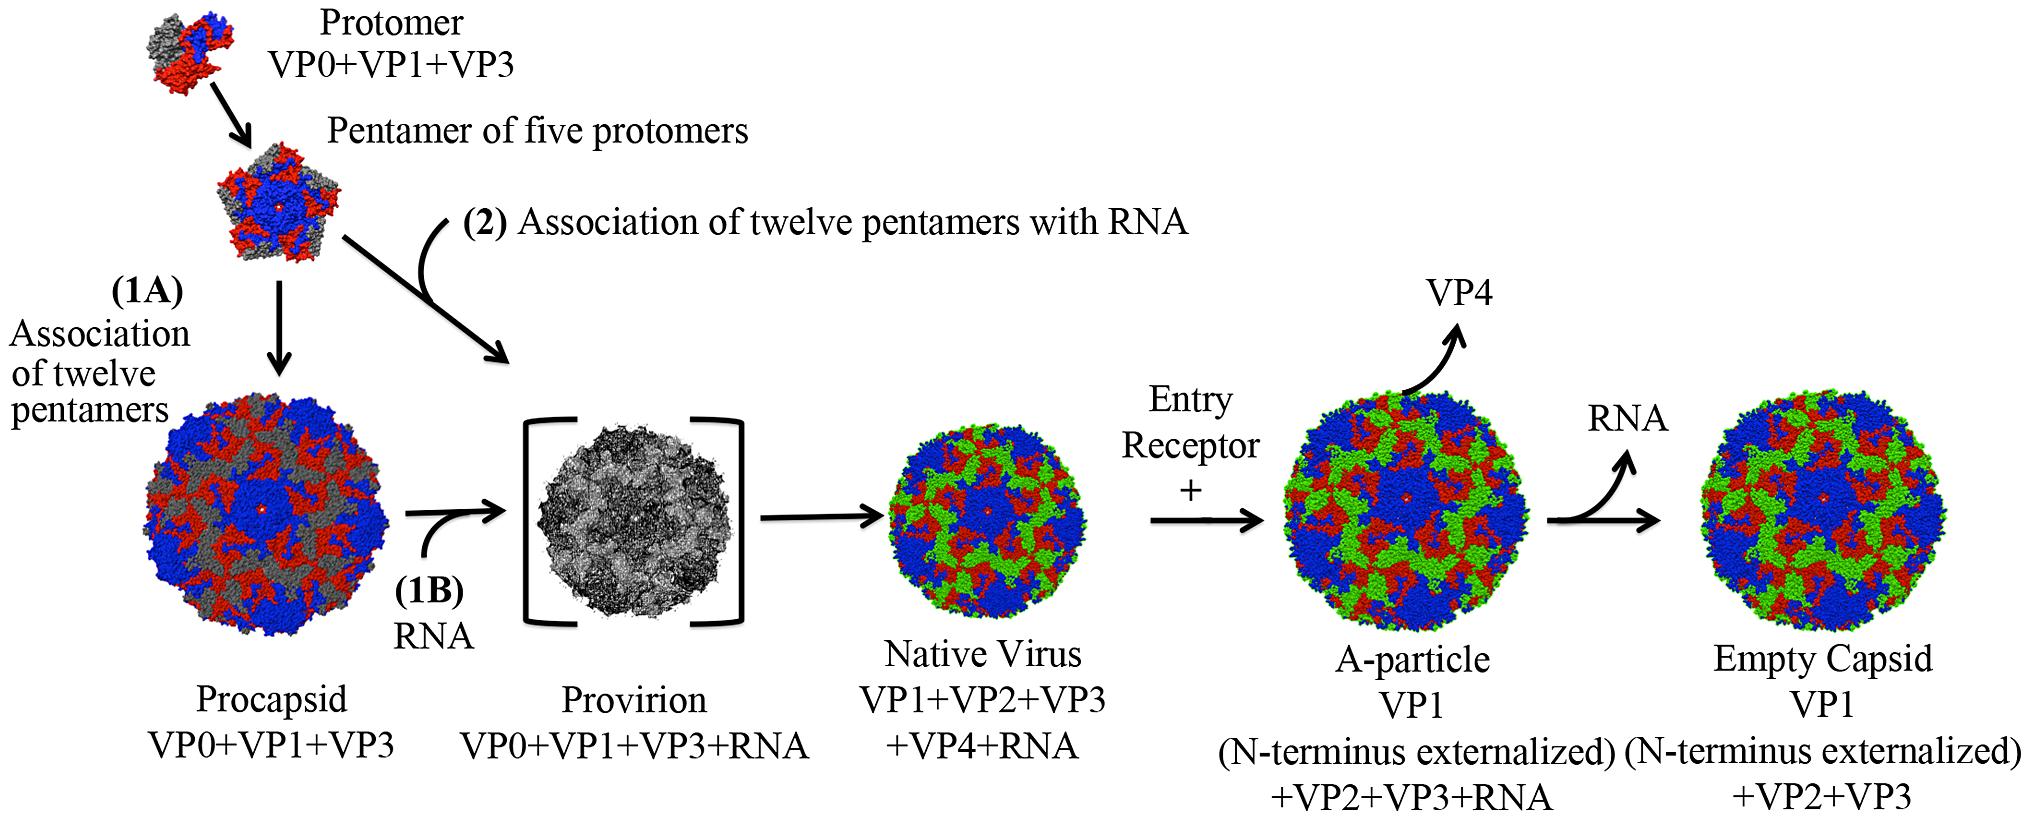 Lifecycle of a human enterovirus.